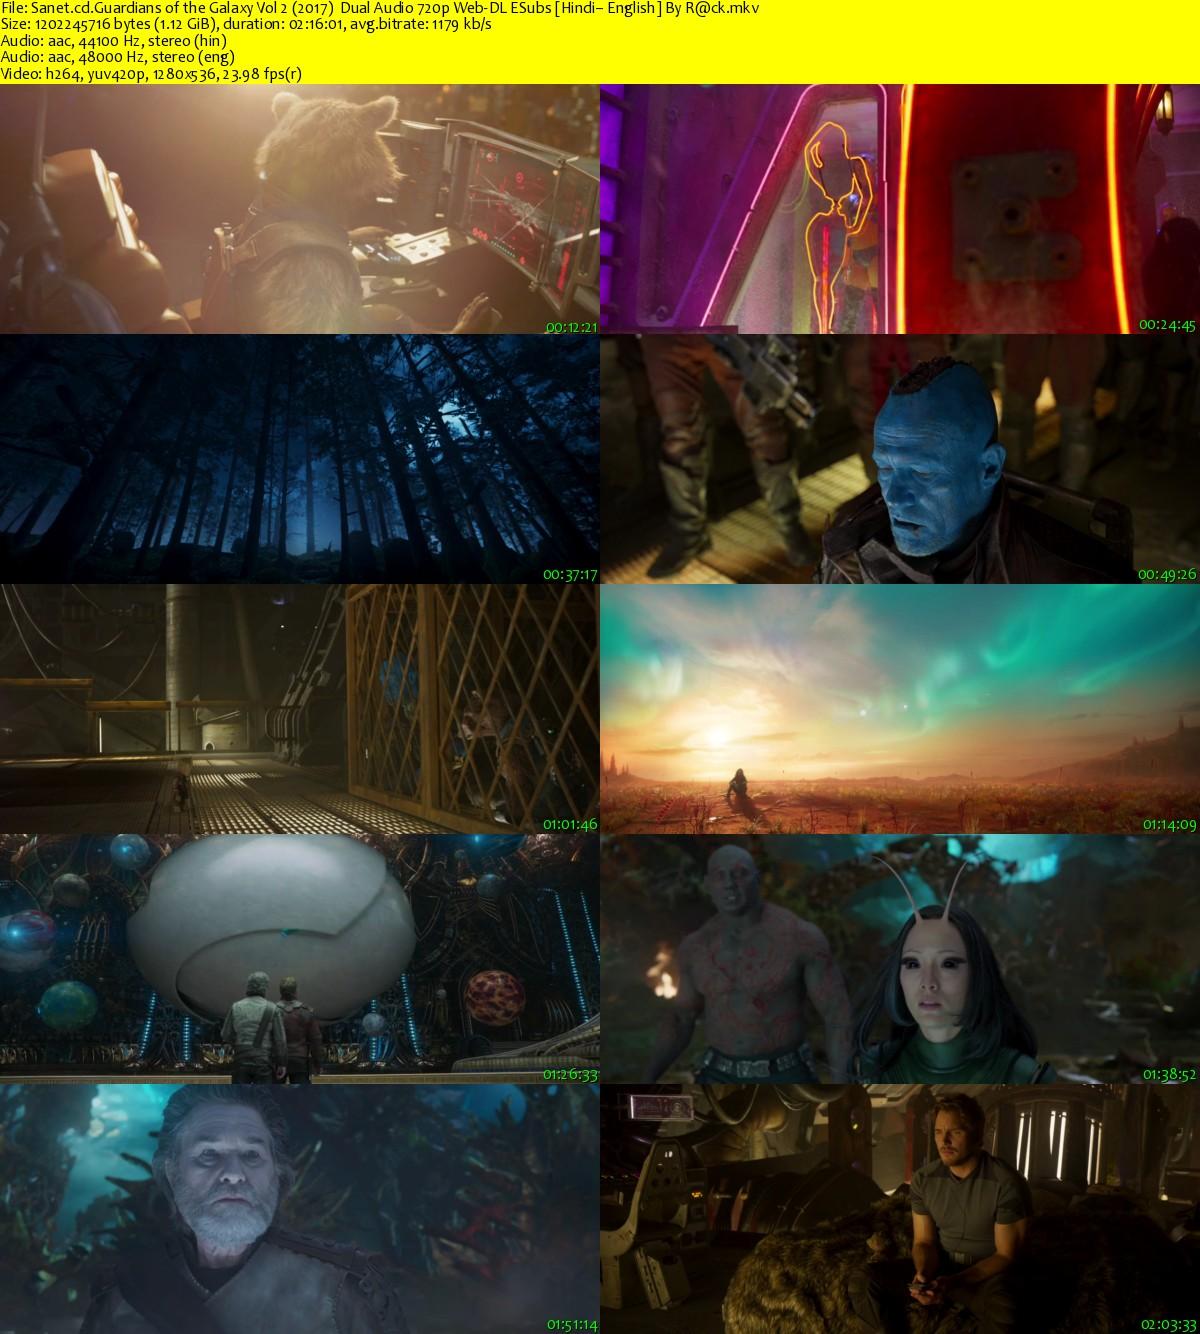 guardians of the galaxy 2 kickass 1080p